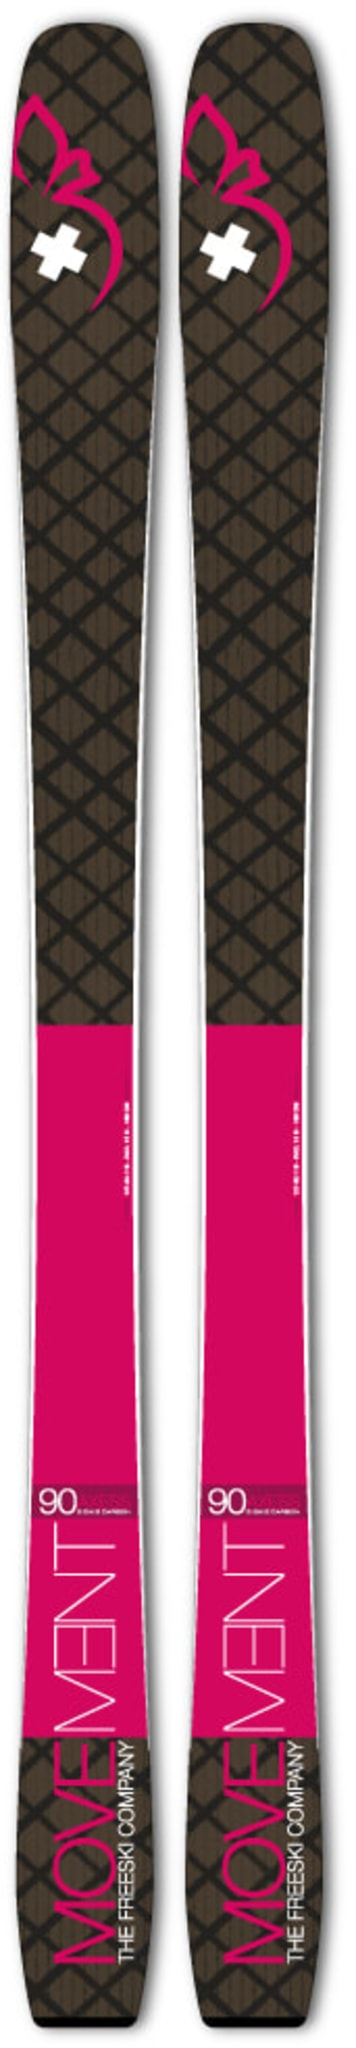 Ws AXESS 90 & Marker Alpinist 9